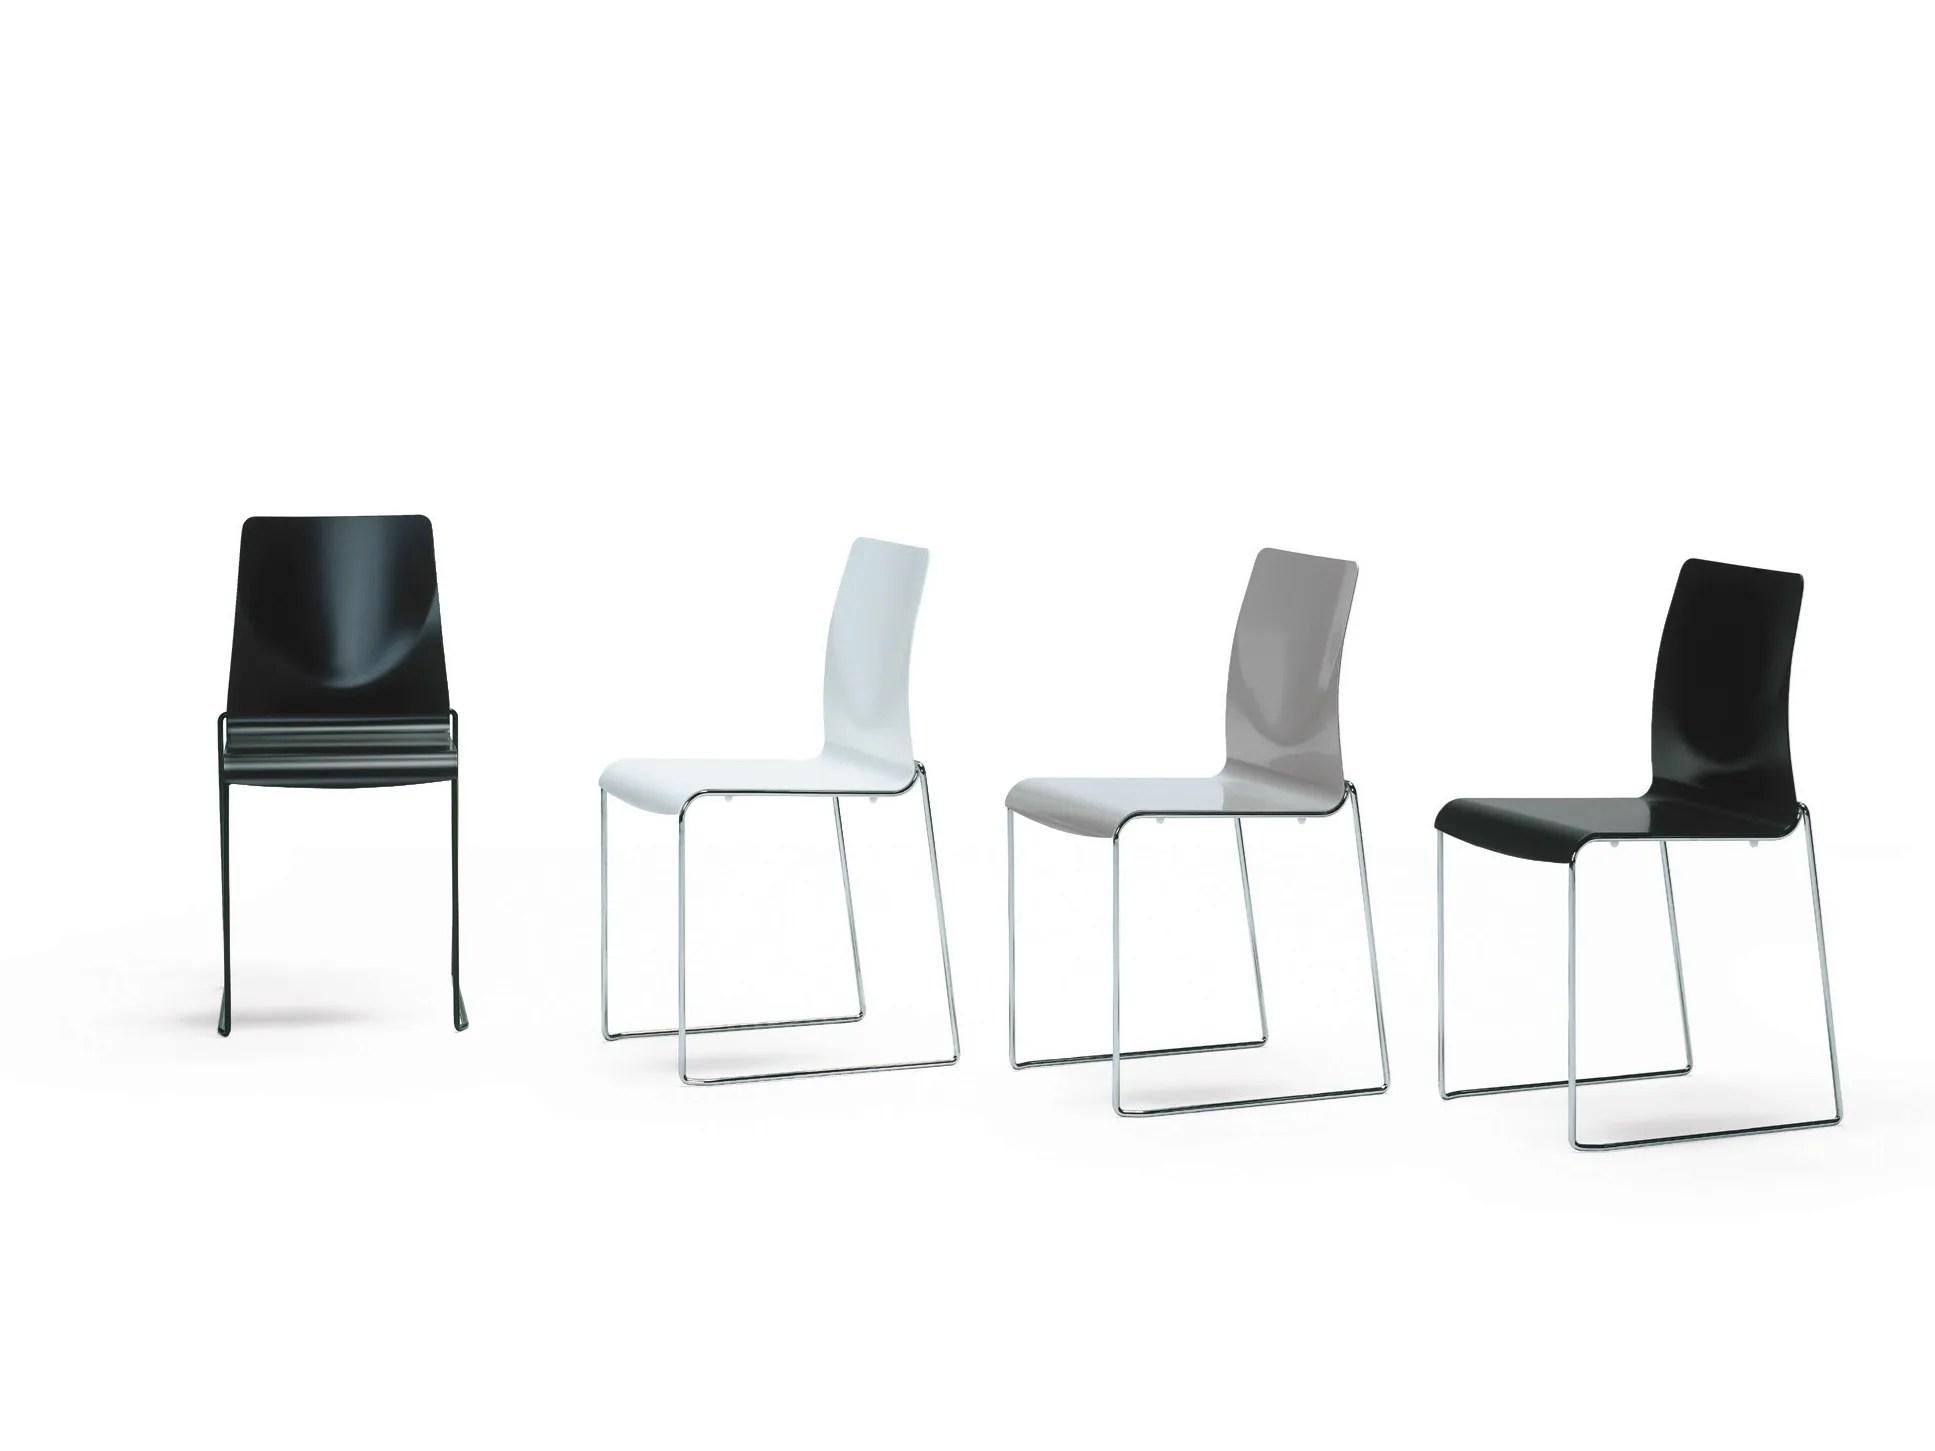 fire retardant chairs barcelona chair replica uk camilla by ydf design basaglia rota nodari